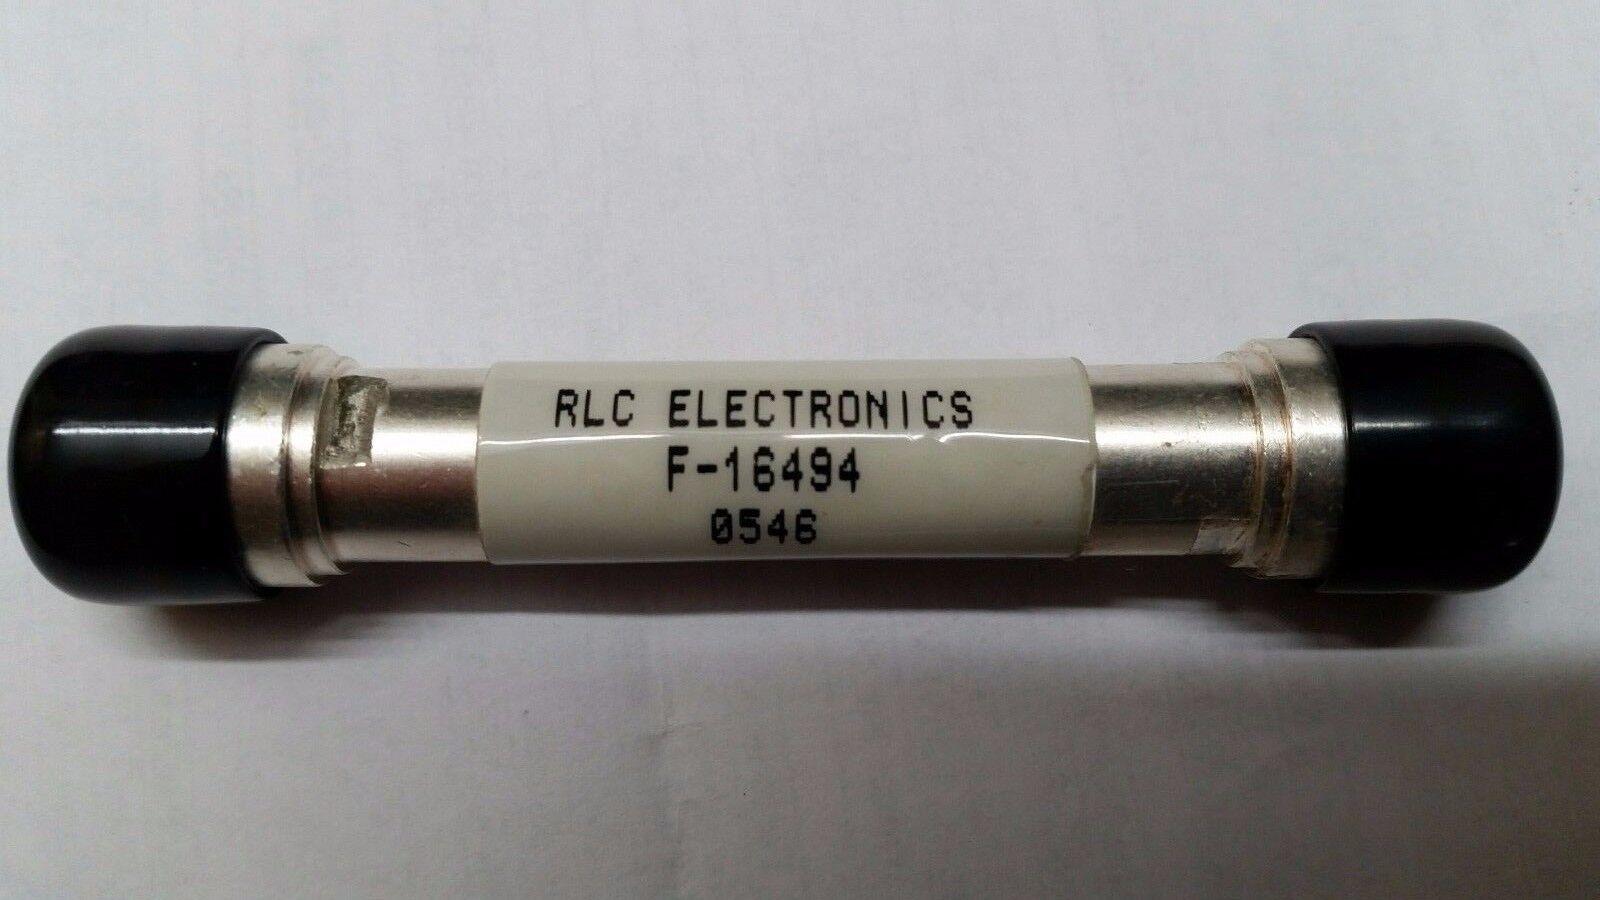 Bandpassfilter F-16494 Band Pass Filter, 2105 - 2175 MHz